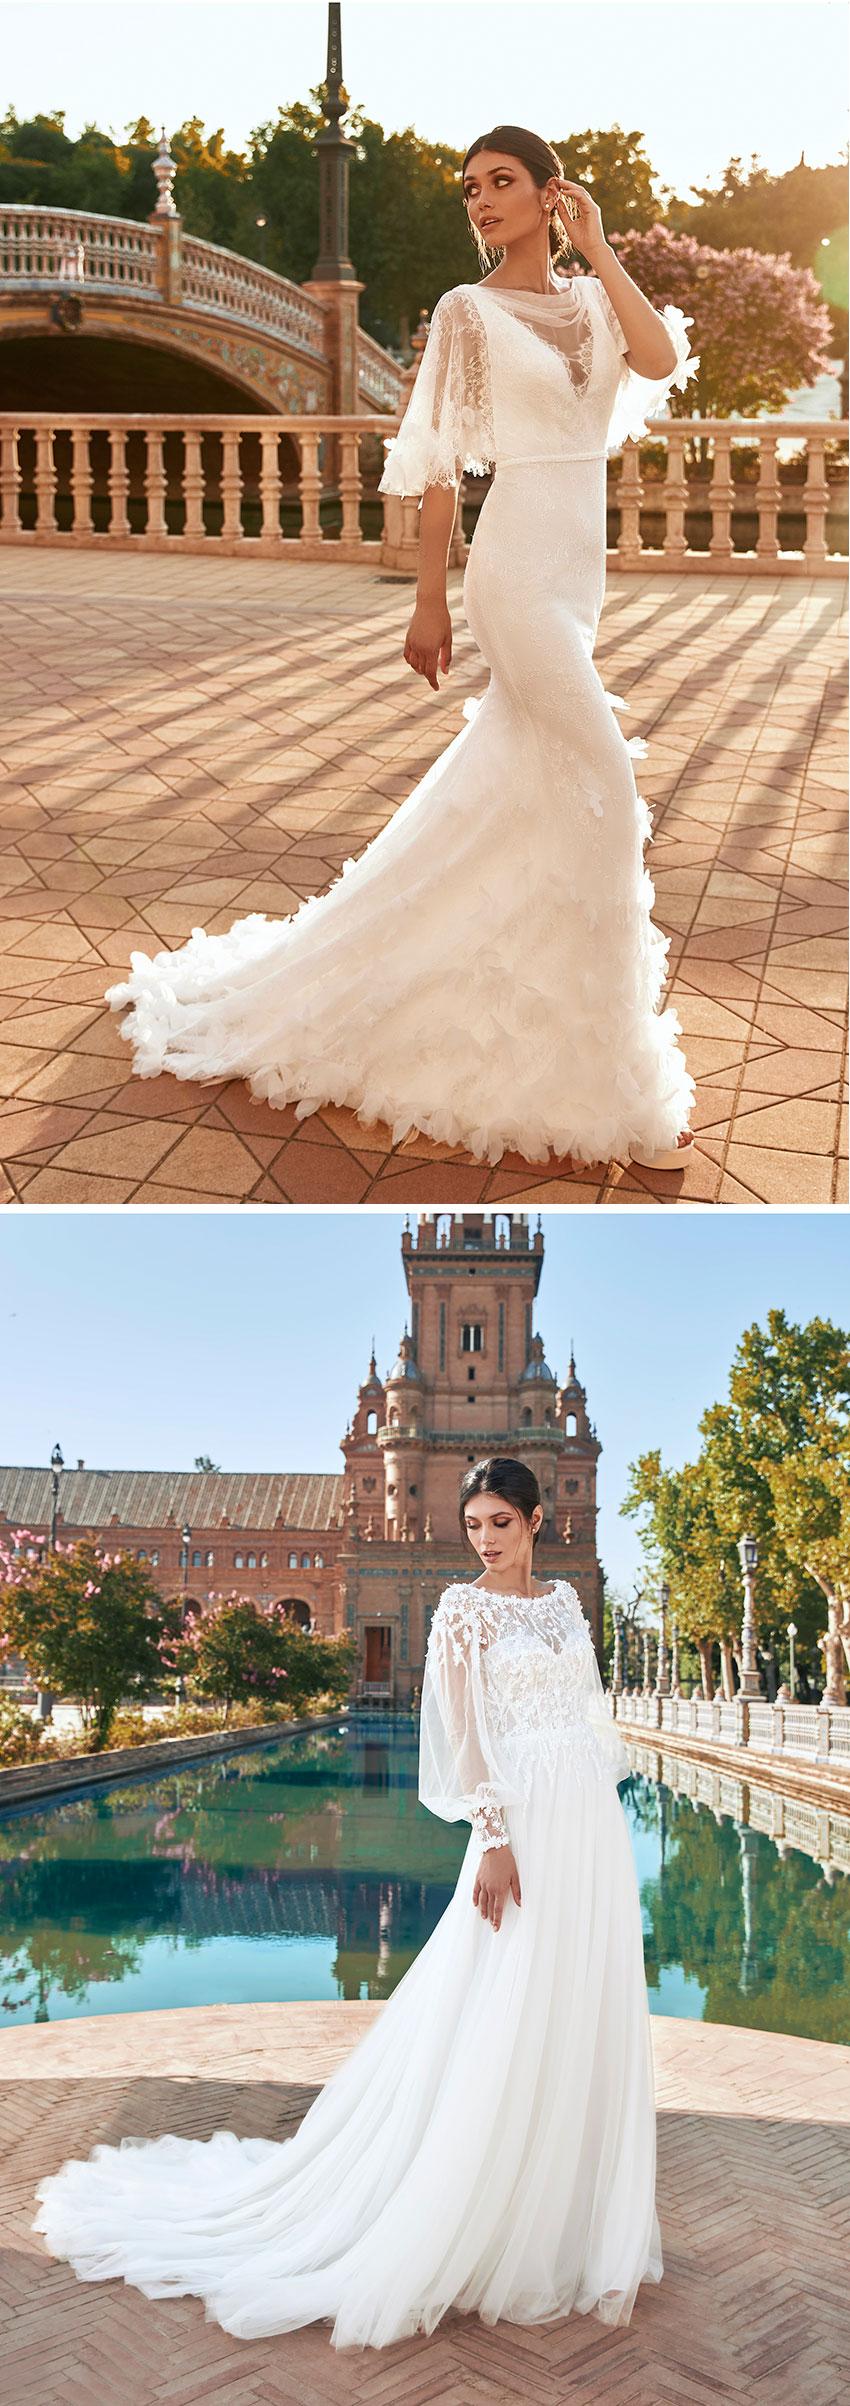 Marchesa for Pronovias wedding dresses Perfect Wedding Magazine